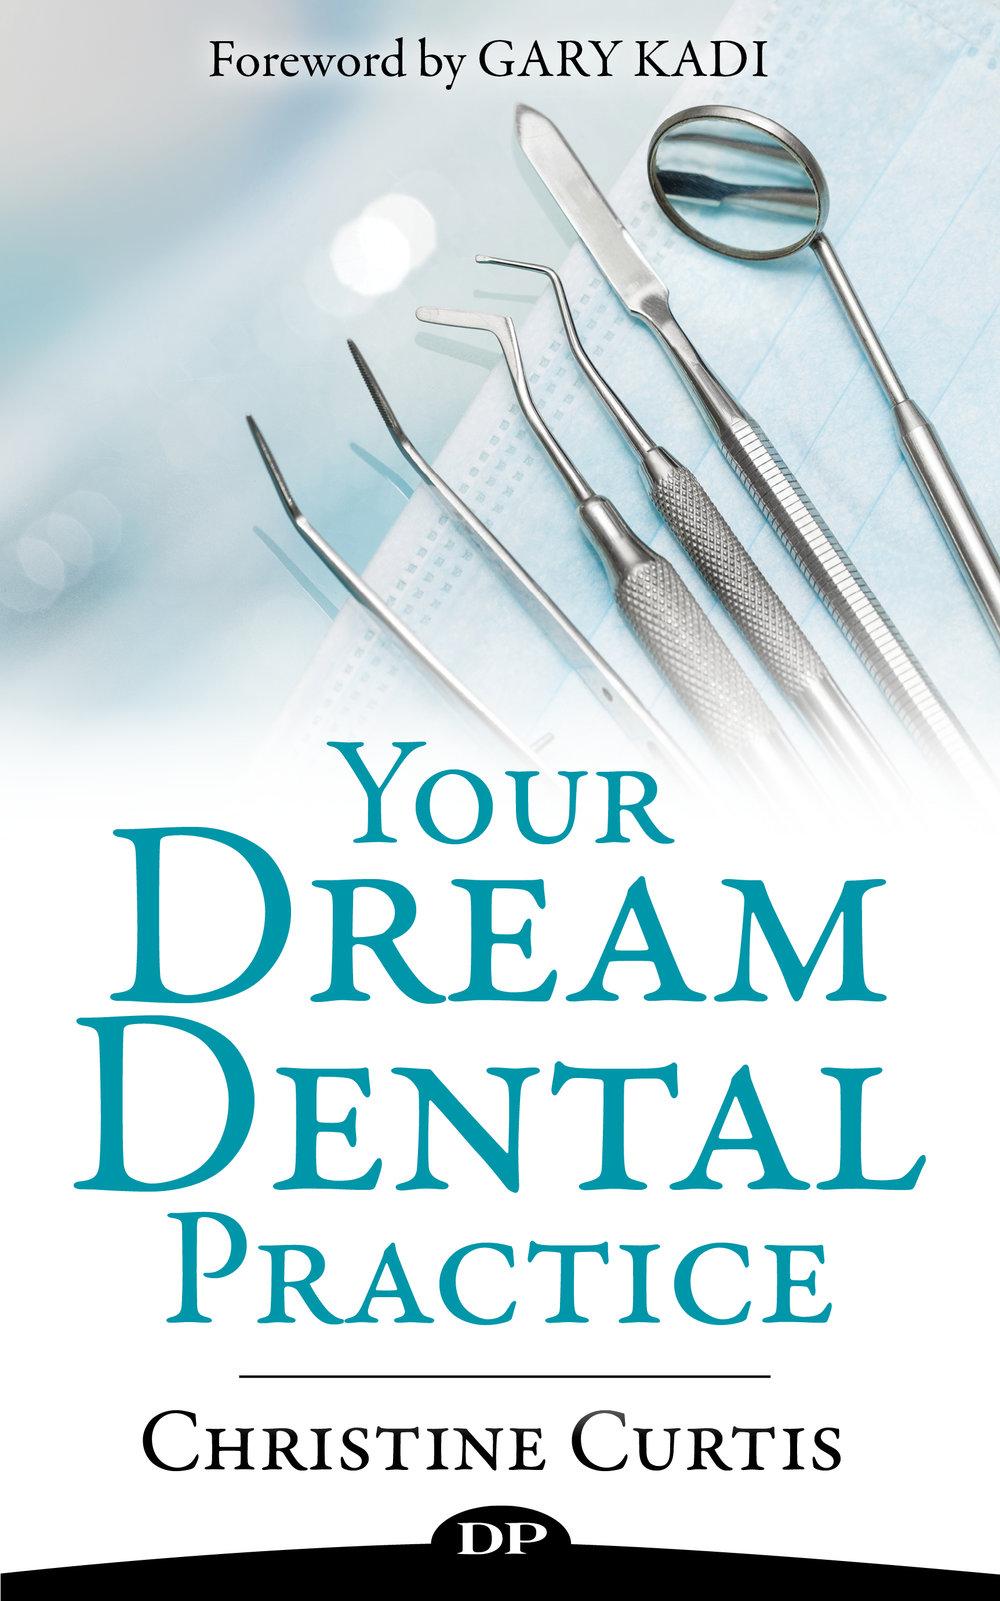 Curtis_Your Dream Dental Practice_EBK_FINAL.jpg